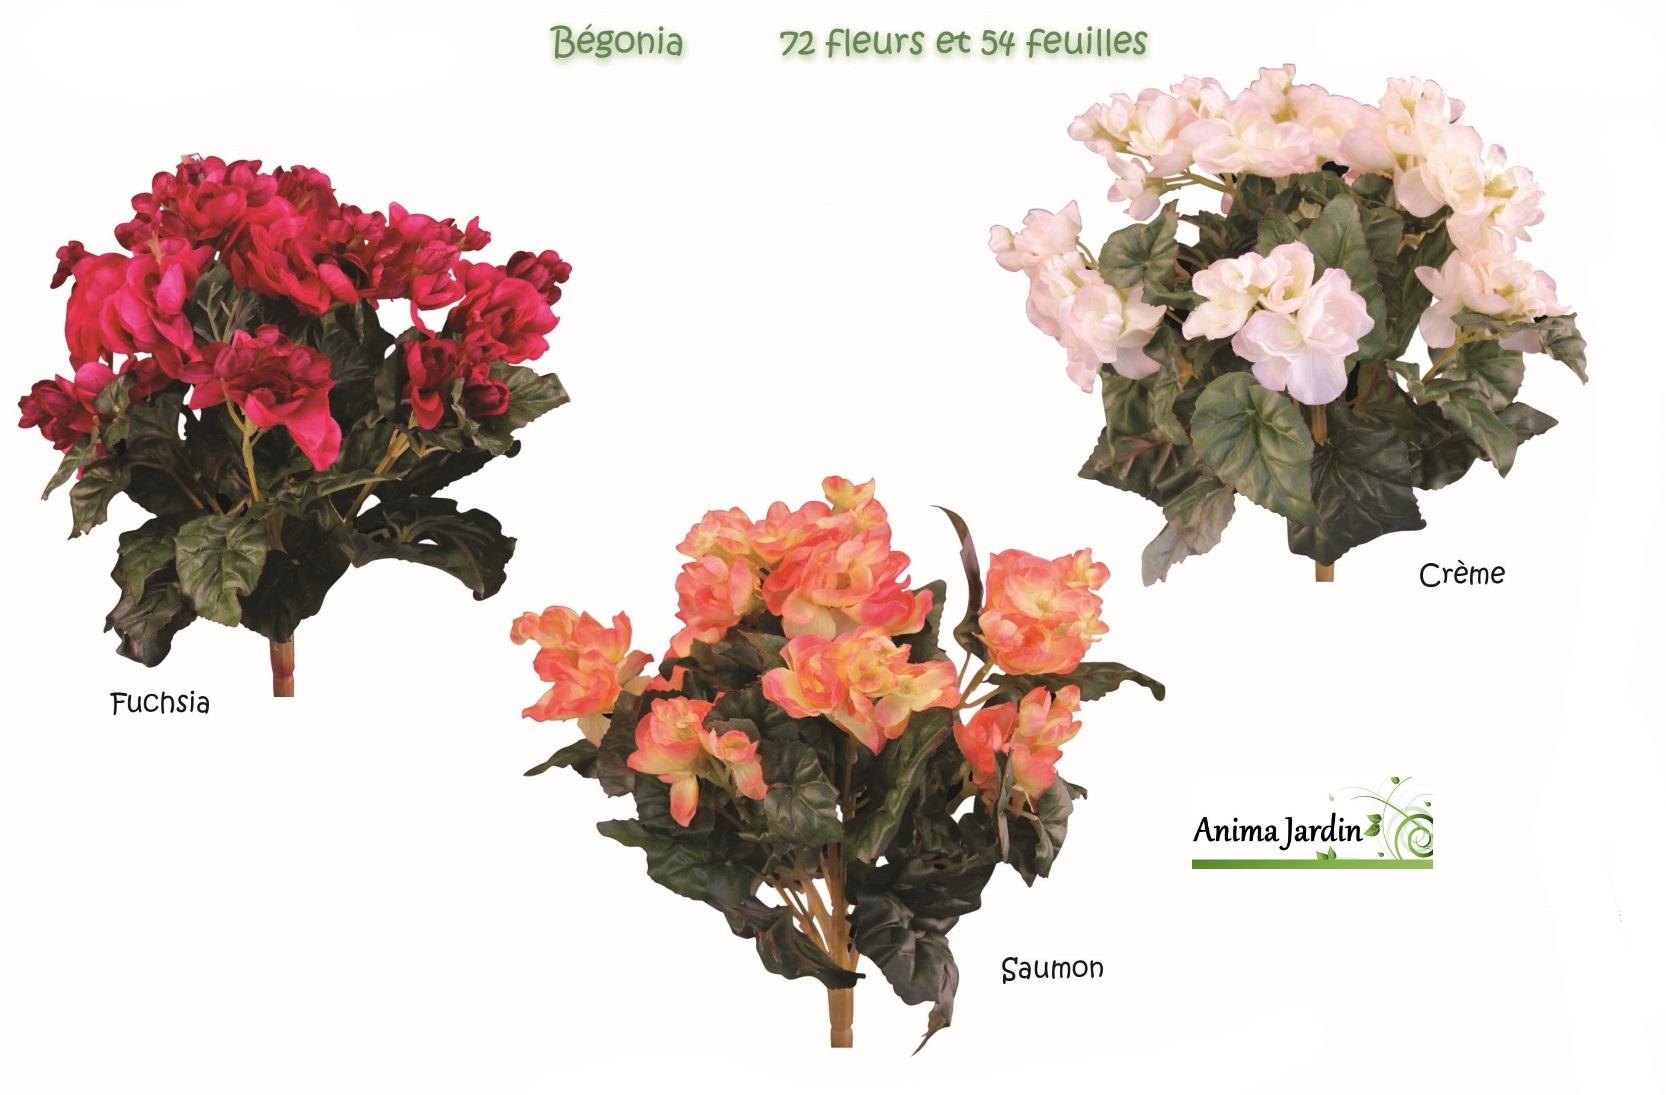 bégonias-3-couleurs-anima-jardin.fr